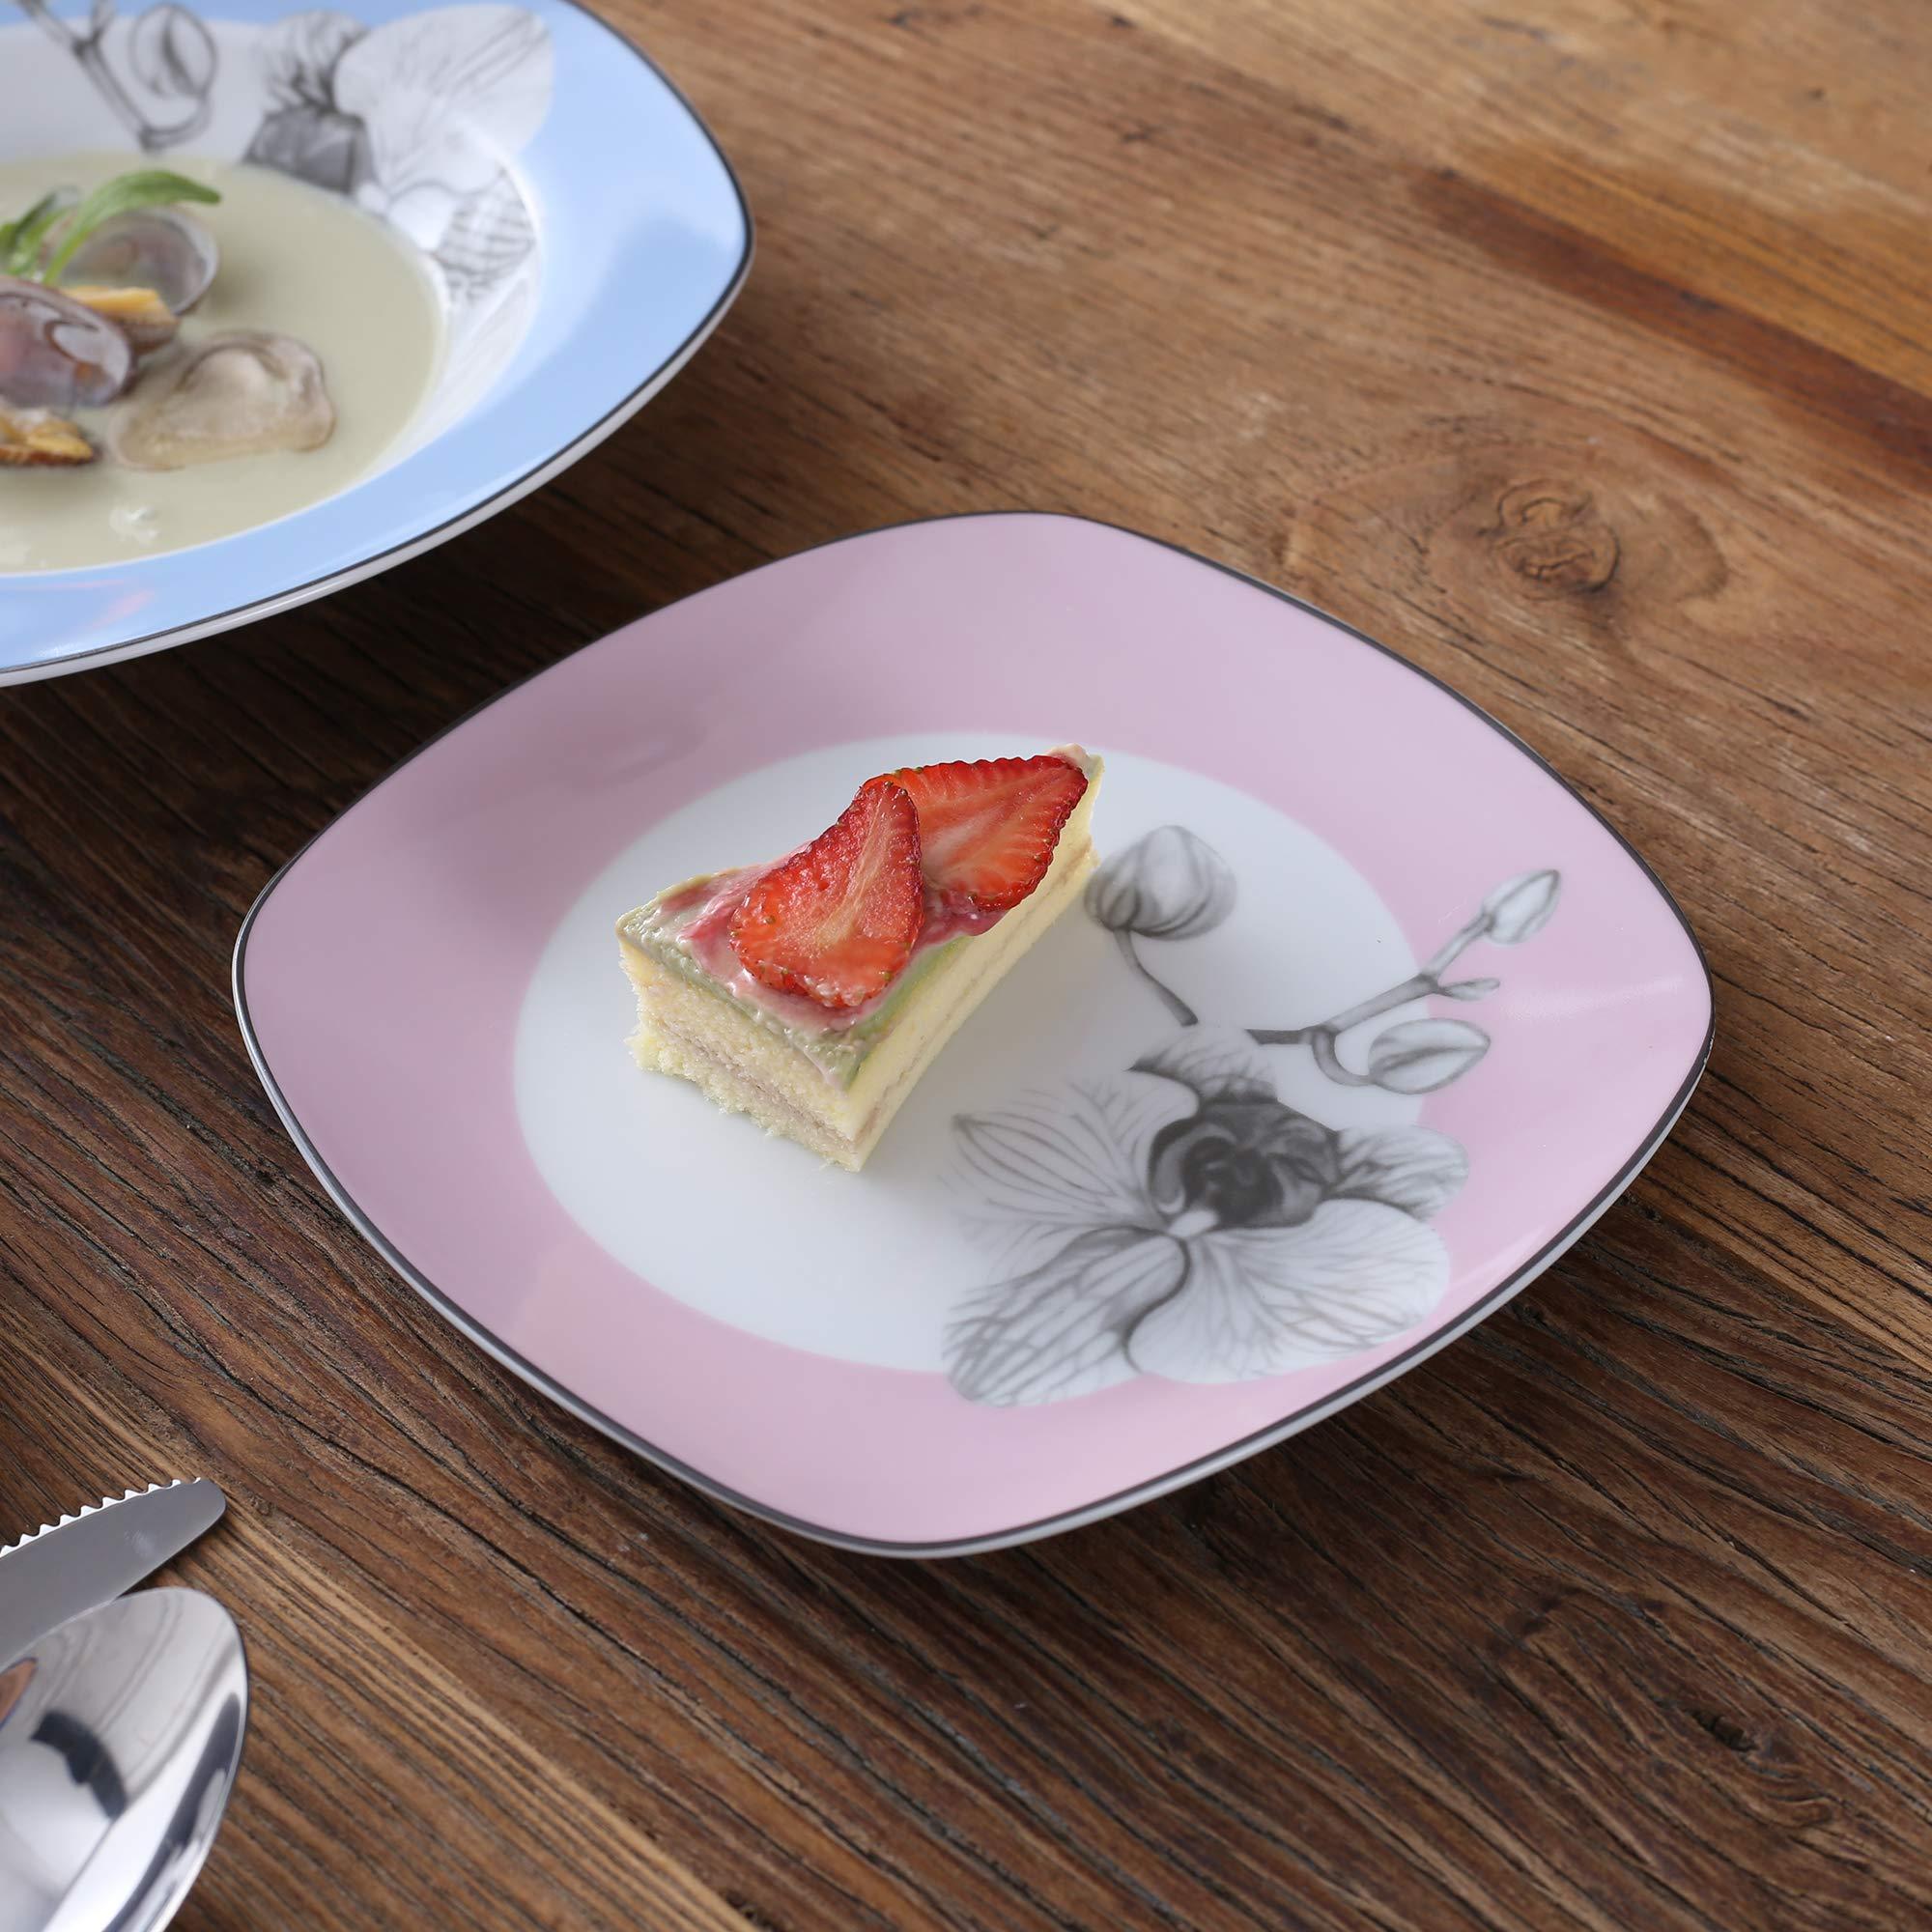 VEWEET 4-Piece Porcelain Dessert Plate Set, Durable Ivory White Bread 7-1/2 Inch Salad Plates DEBBIE Series by VEWEET (Image #2)